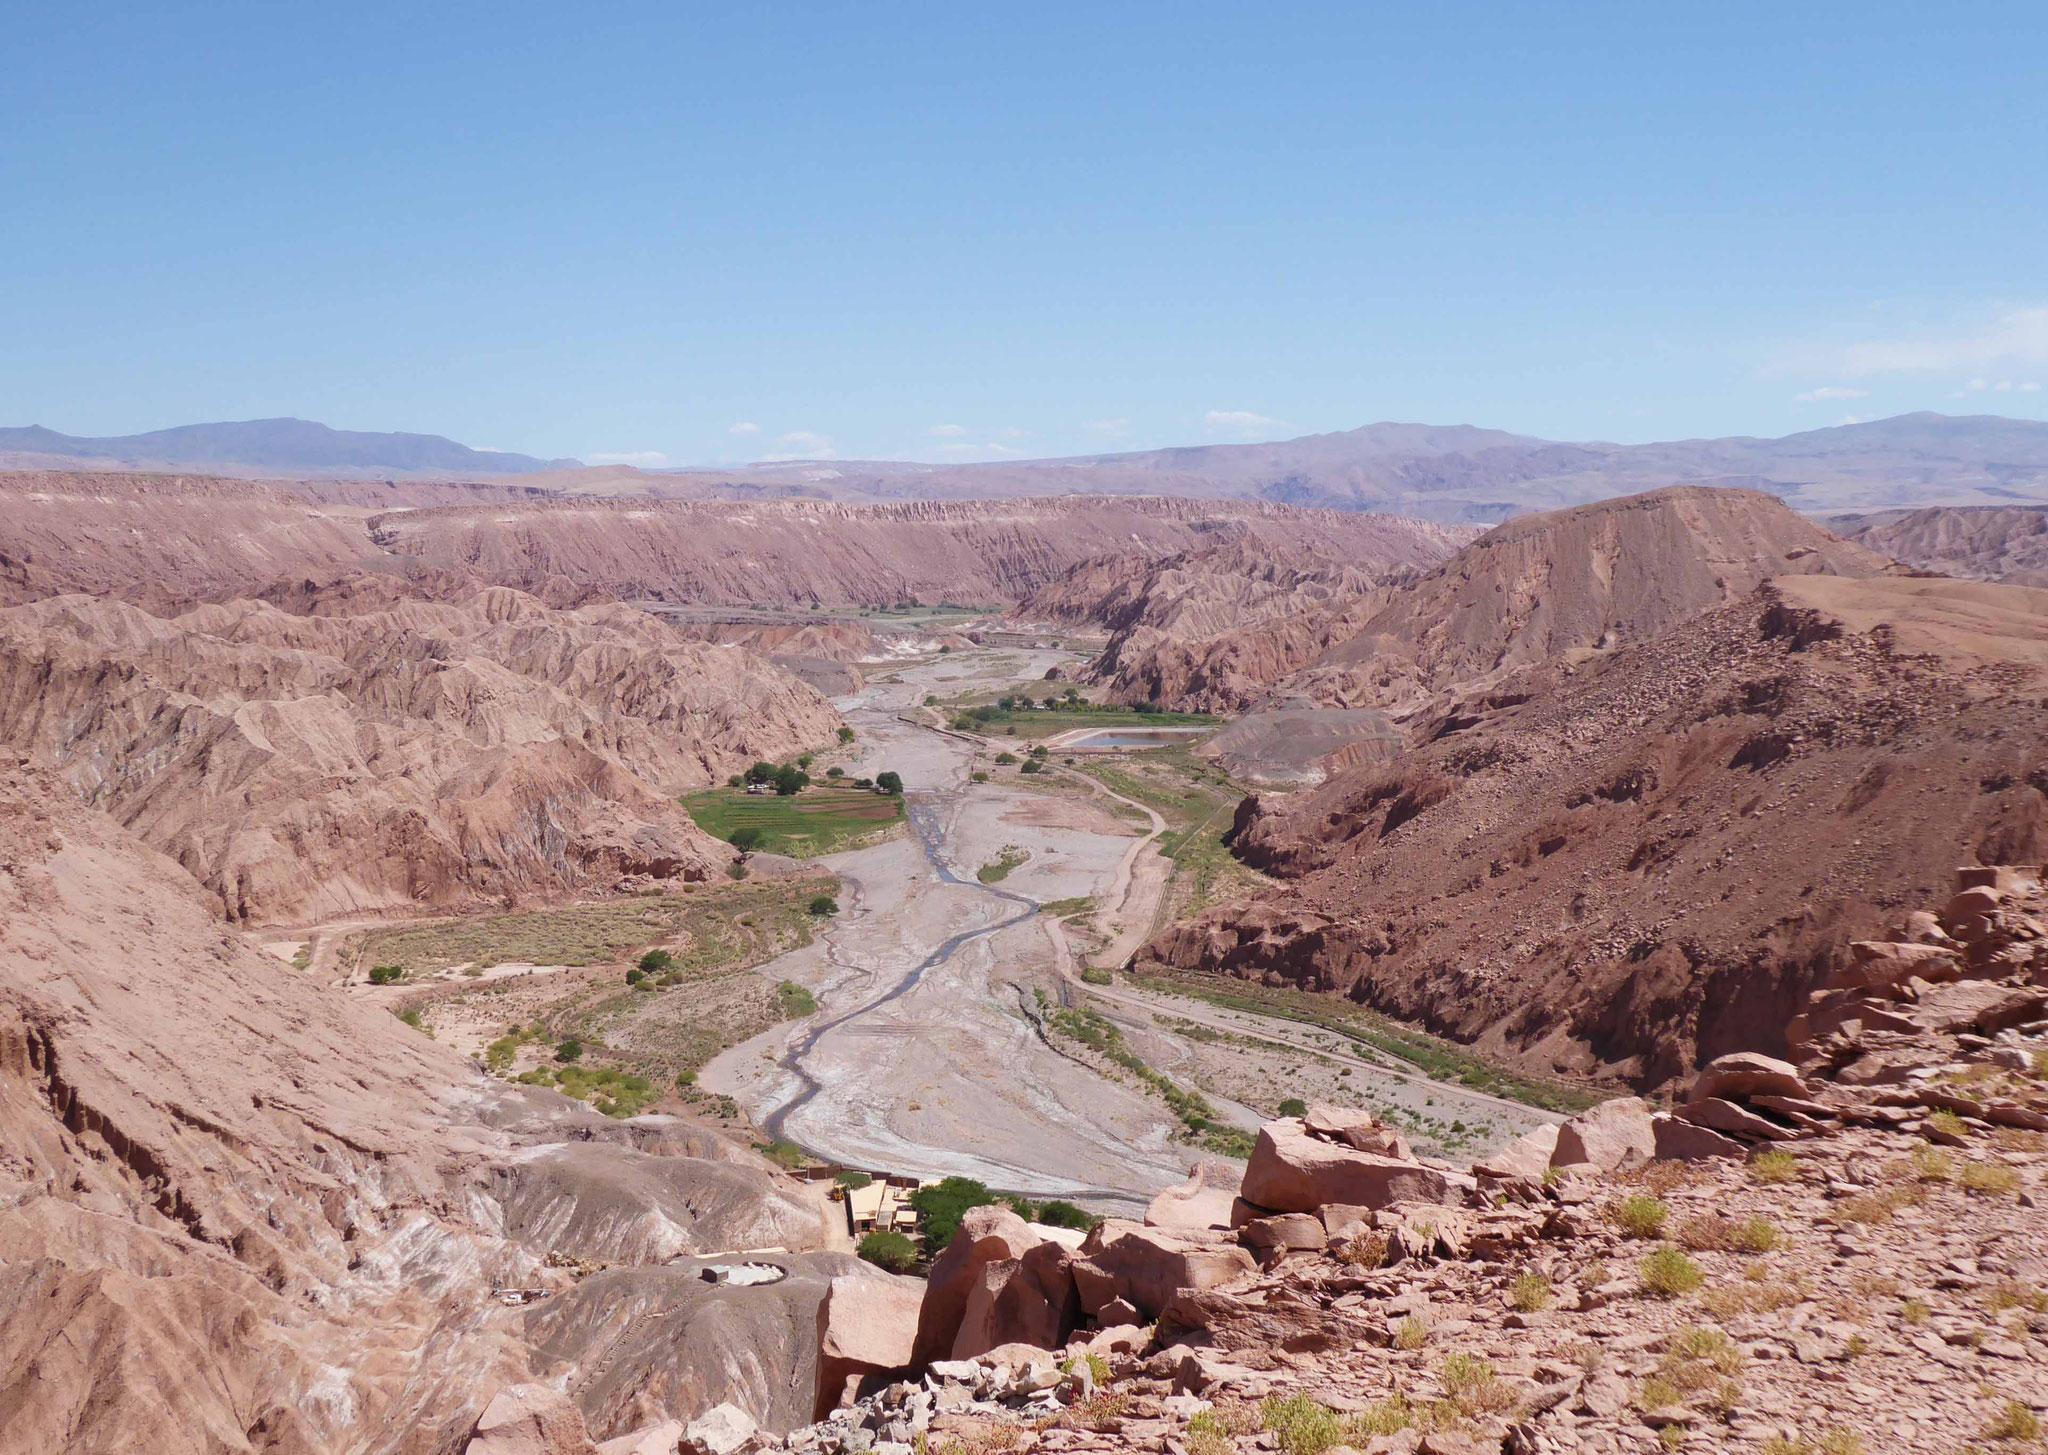 Vue sur la vallée de Catarpe